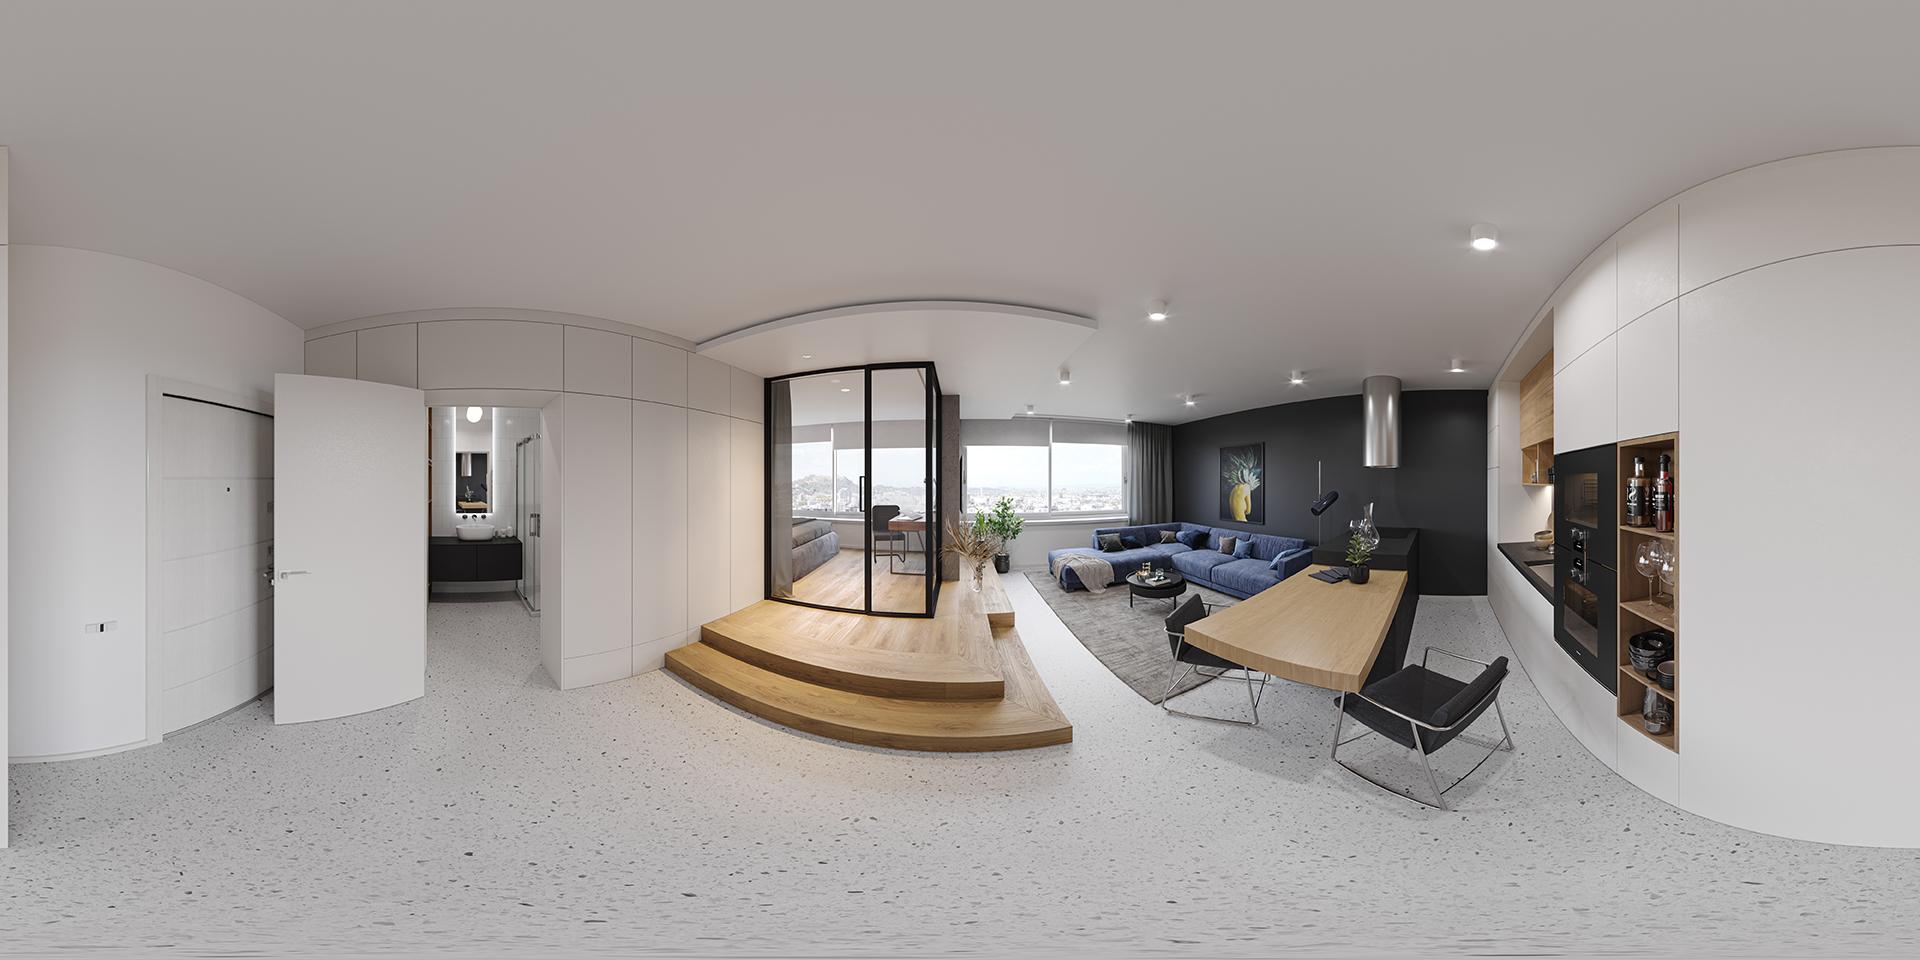 2D Panoramic Image of an Apartment